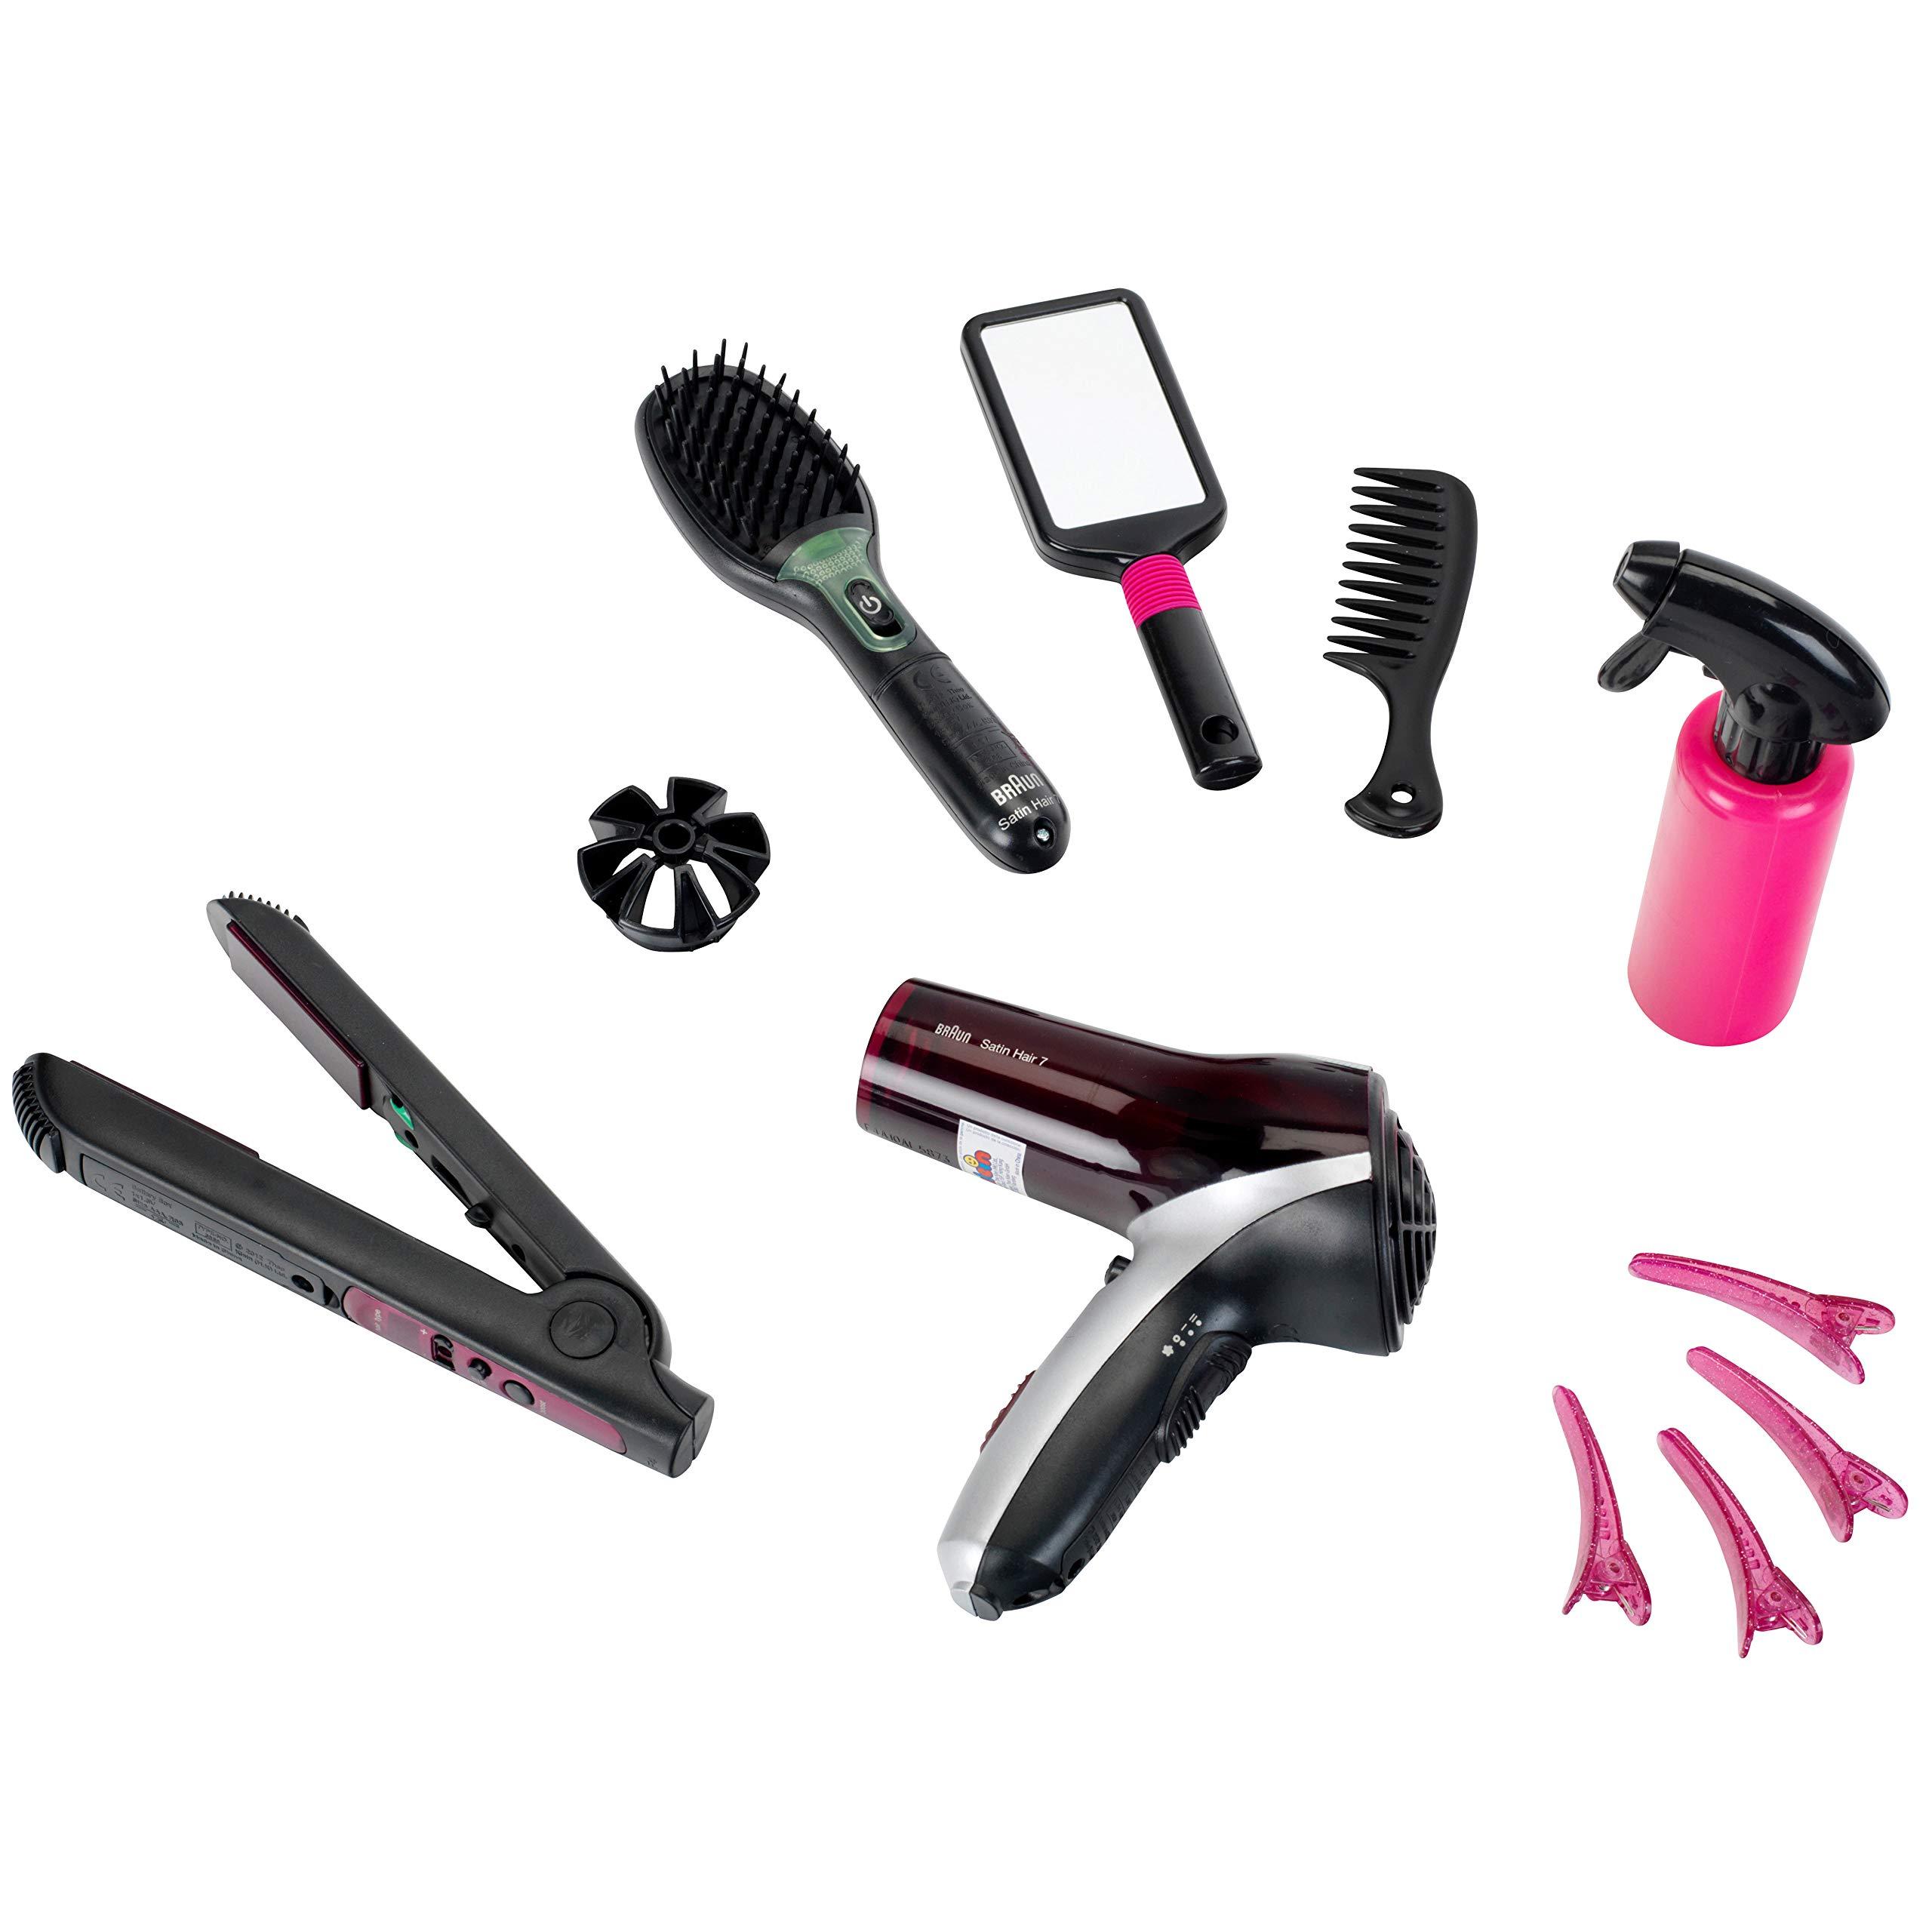 Theo Klein - Braun Mega Hairstyling Set Premium Toys For Kids Ages 3 Years & Up